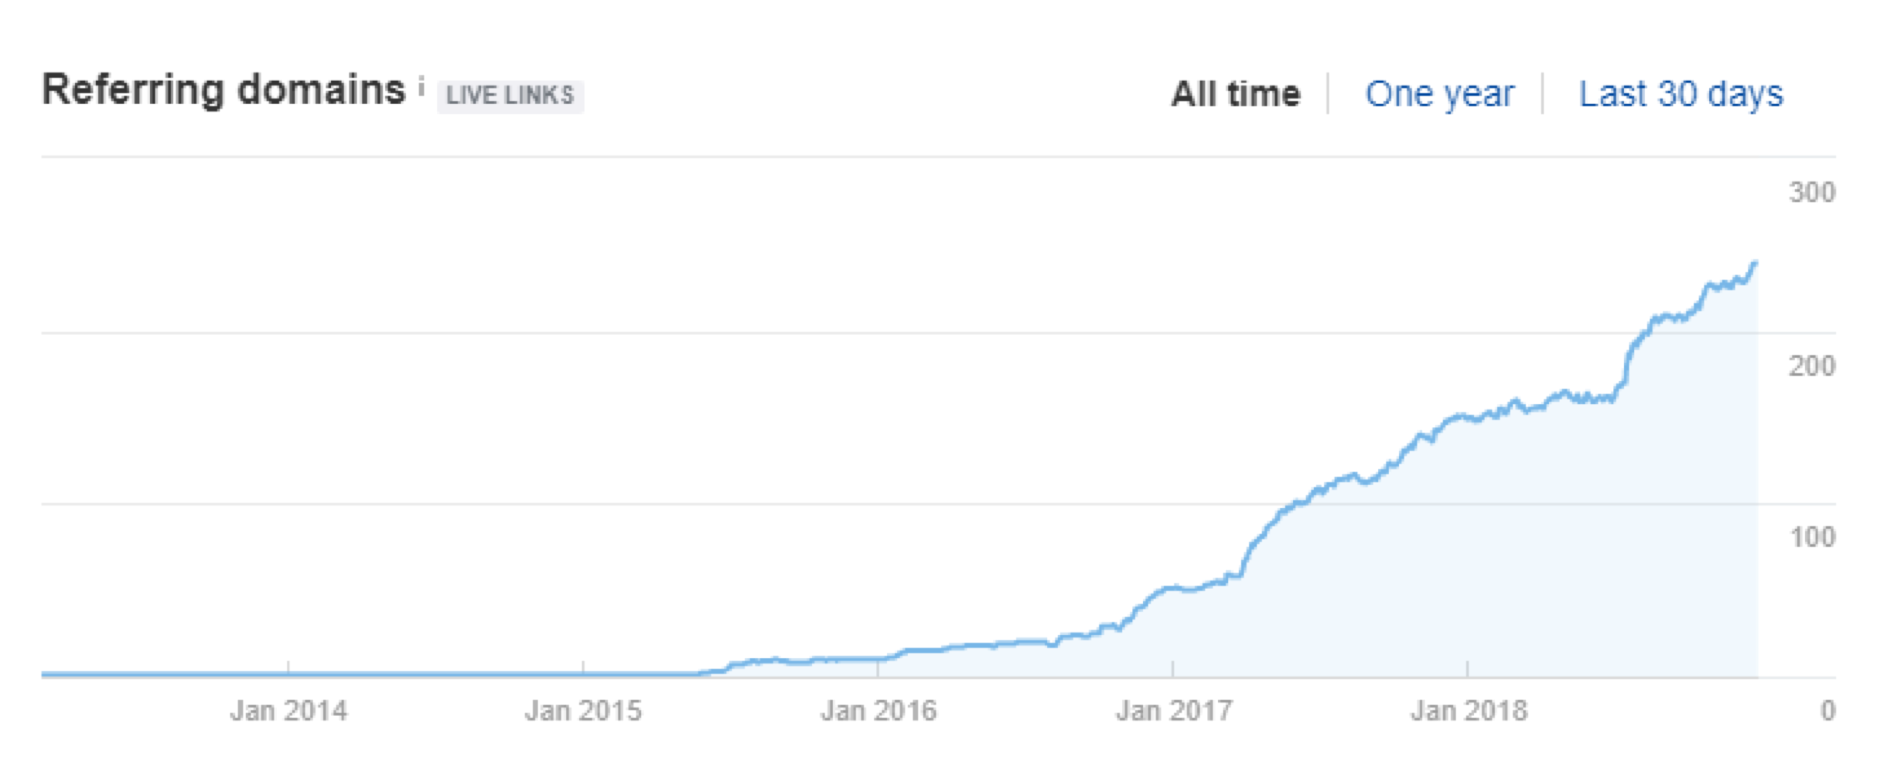 referring domains sample chart 2018